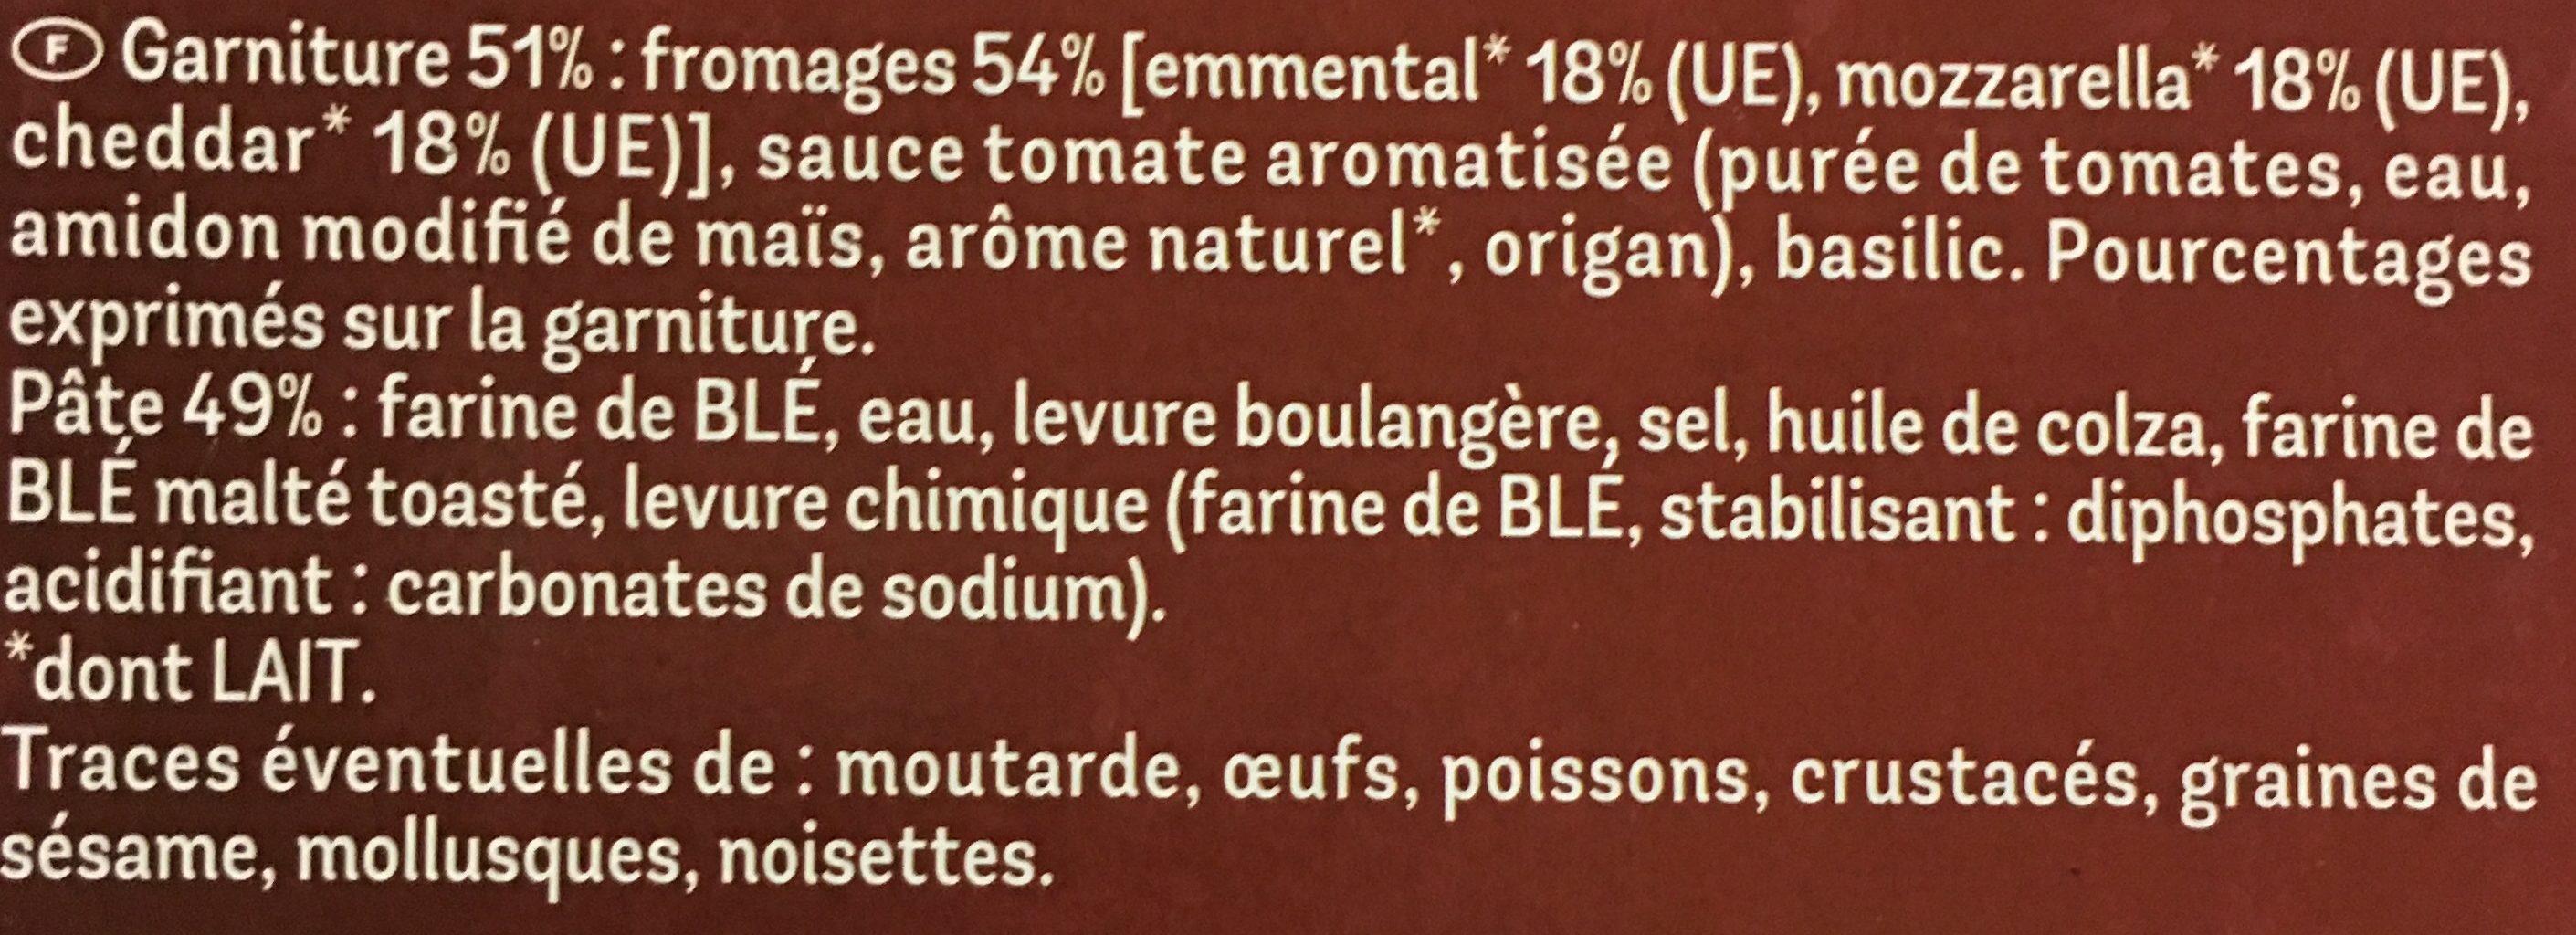 Maxi Moelleuse 4 Fromages - Ingrédients - fr